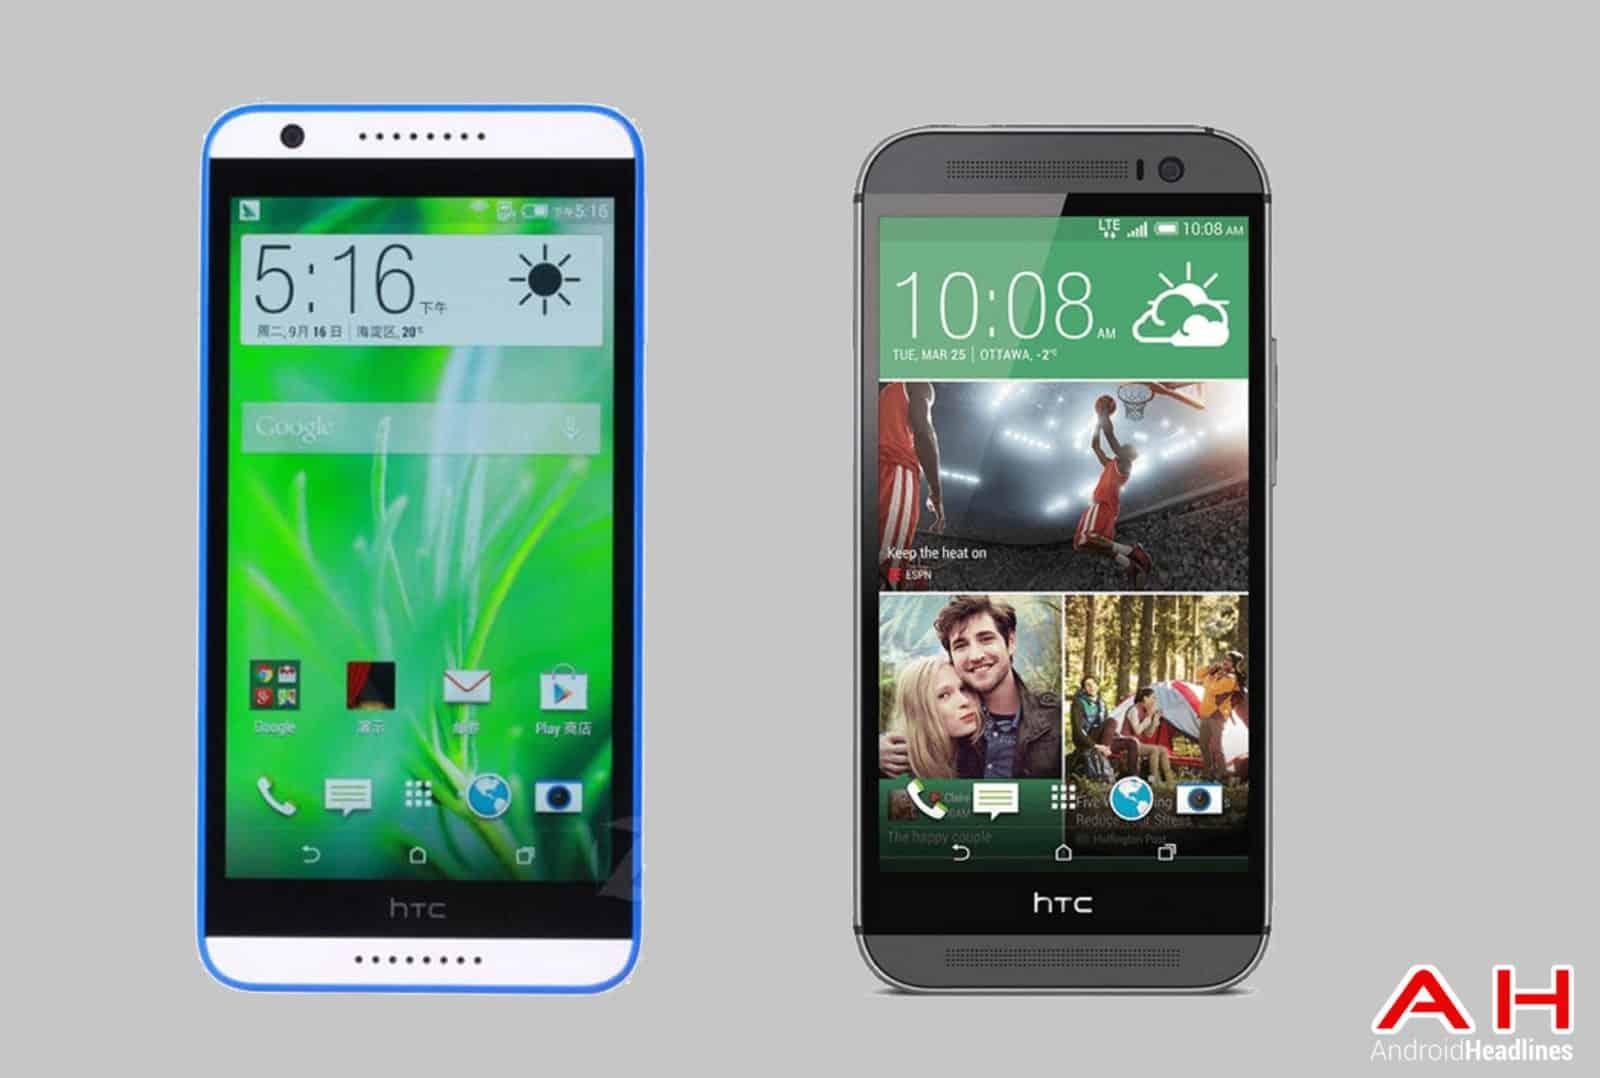 Phone Comparisons: HTC Desire 820 vs HTC One M8